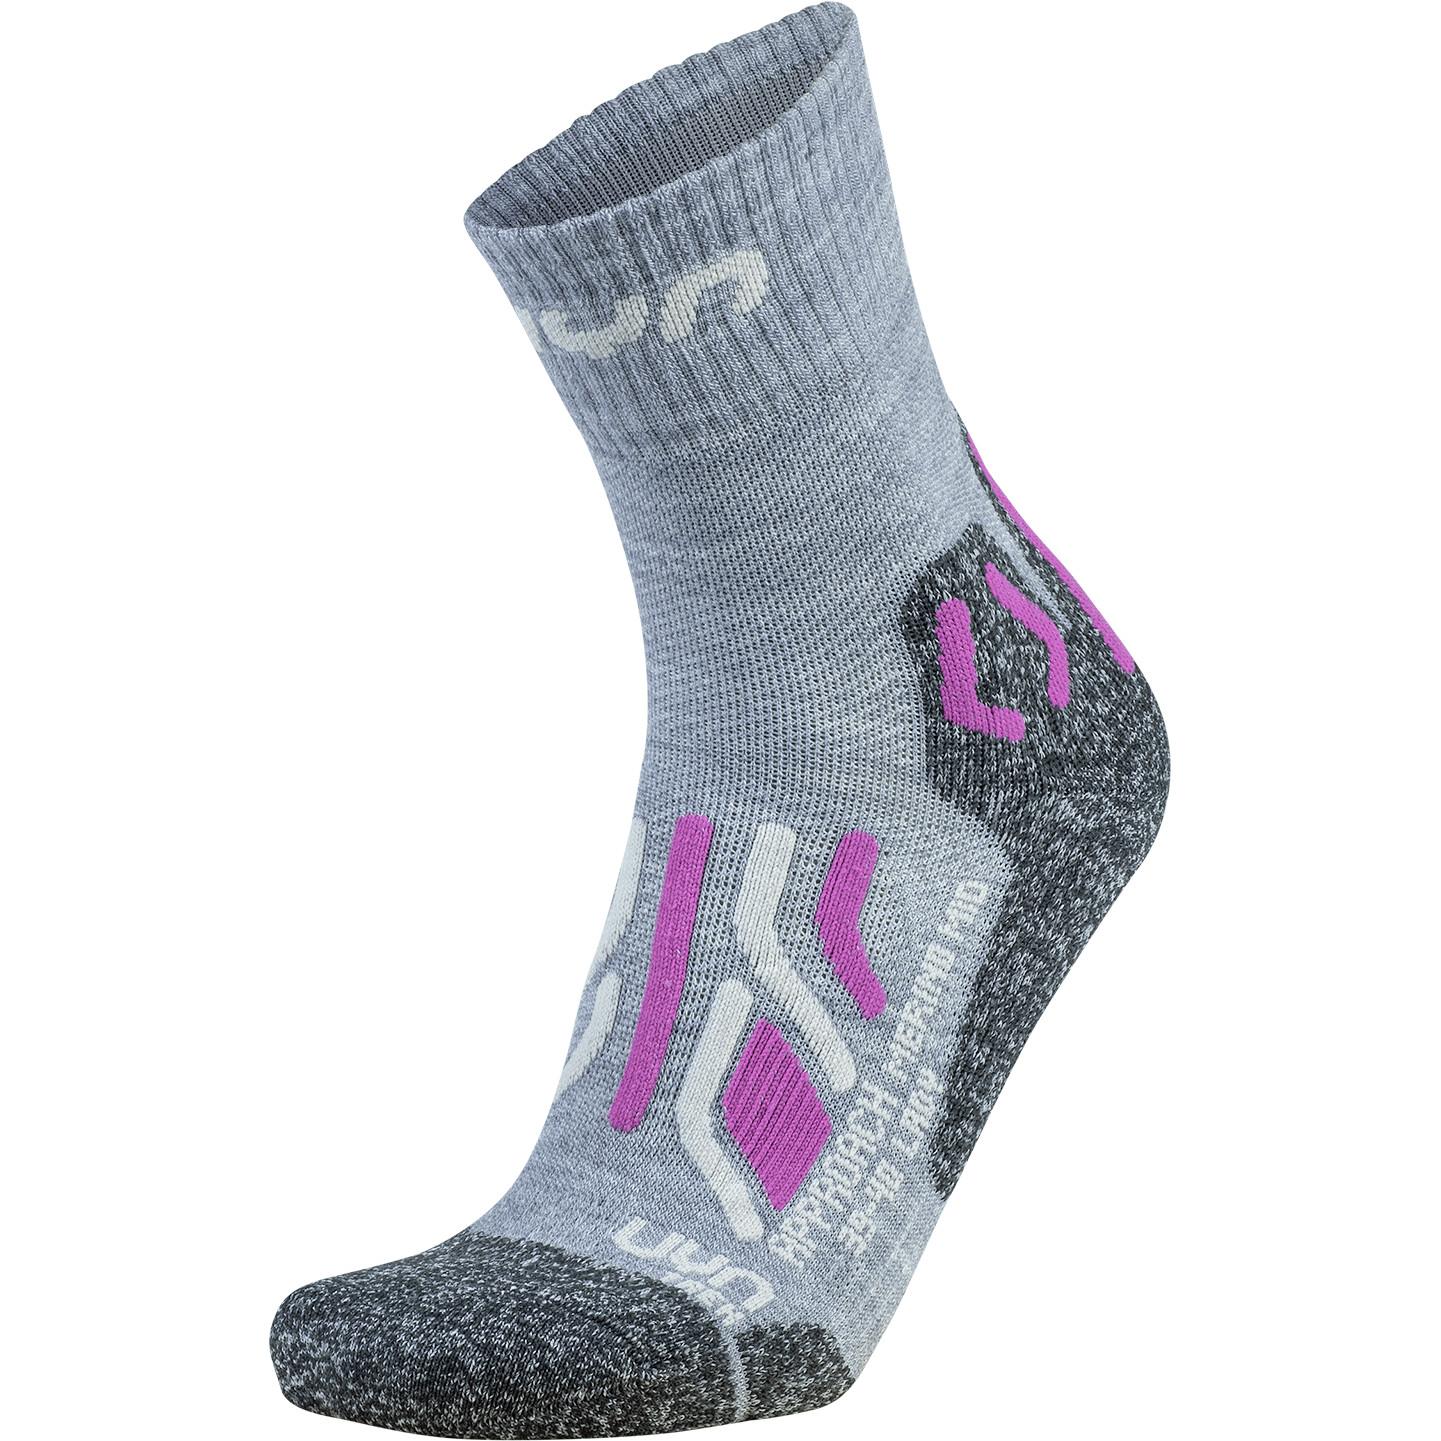 Image of UYN Lady Trekking Approach Merino Mid Cut Socks - Light Grey/Pink